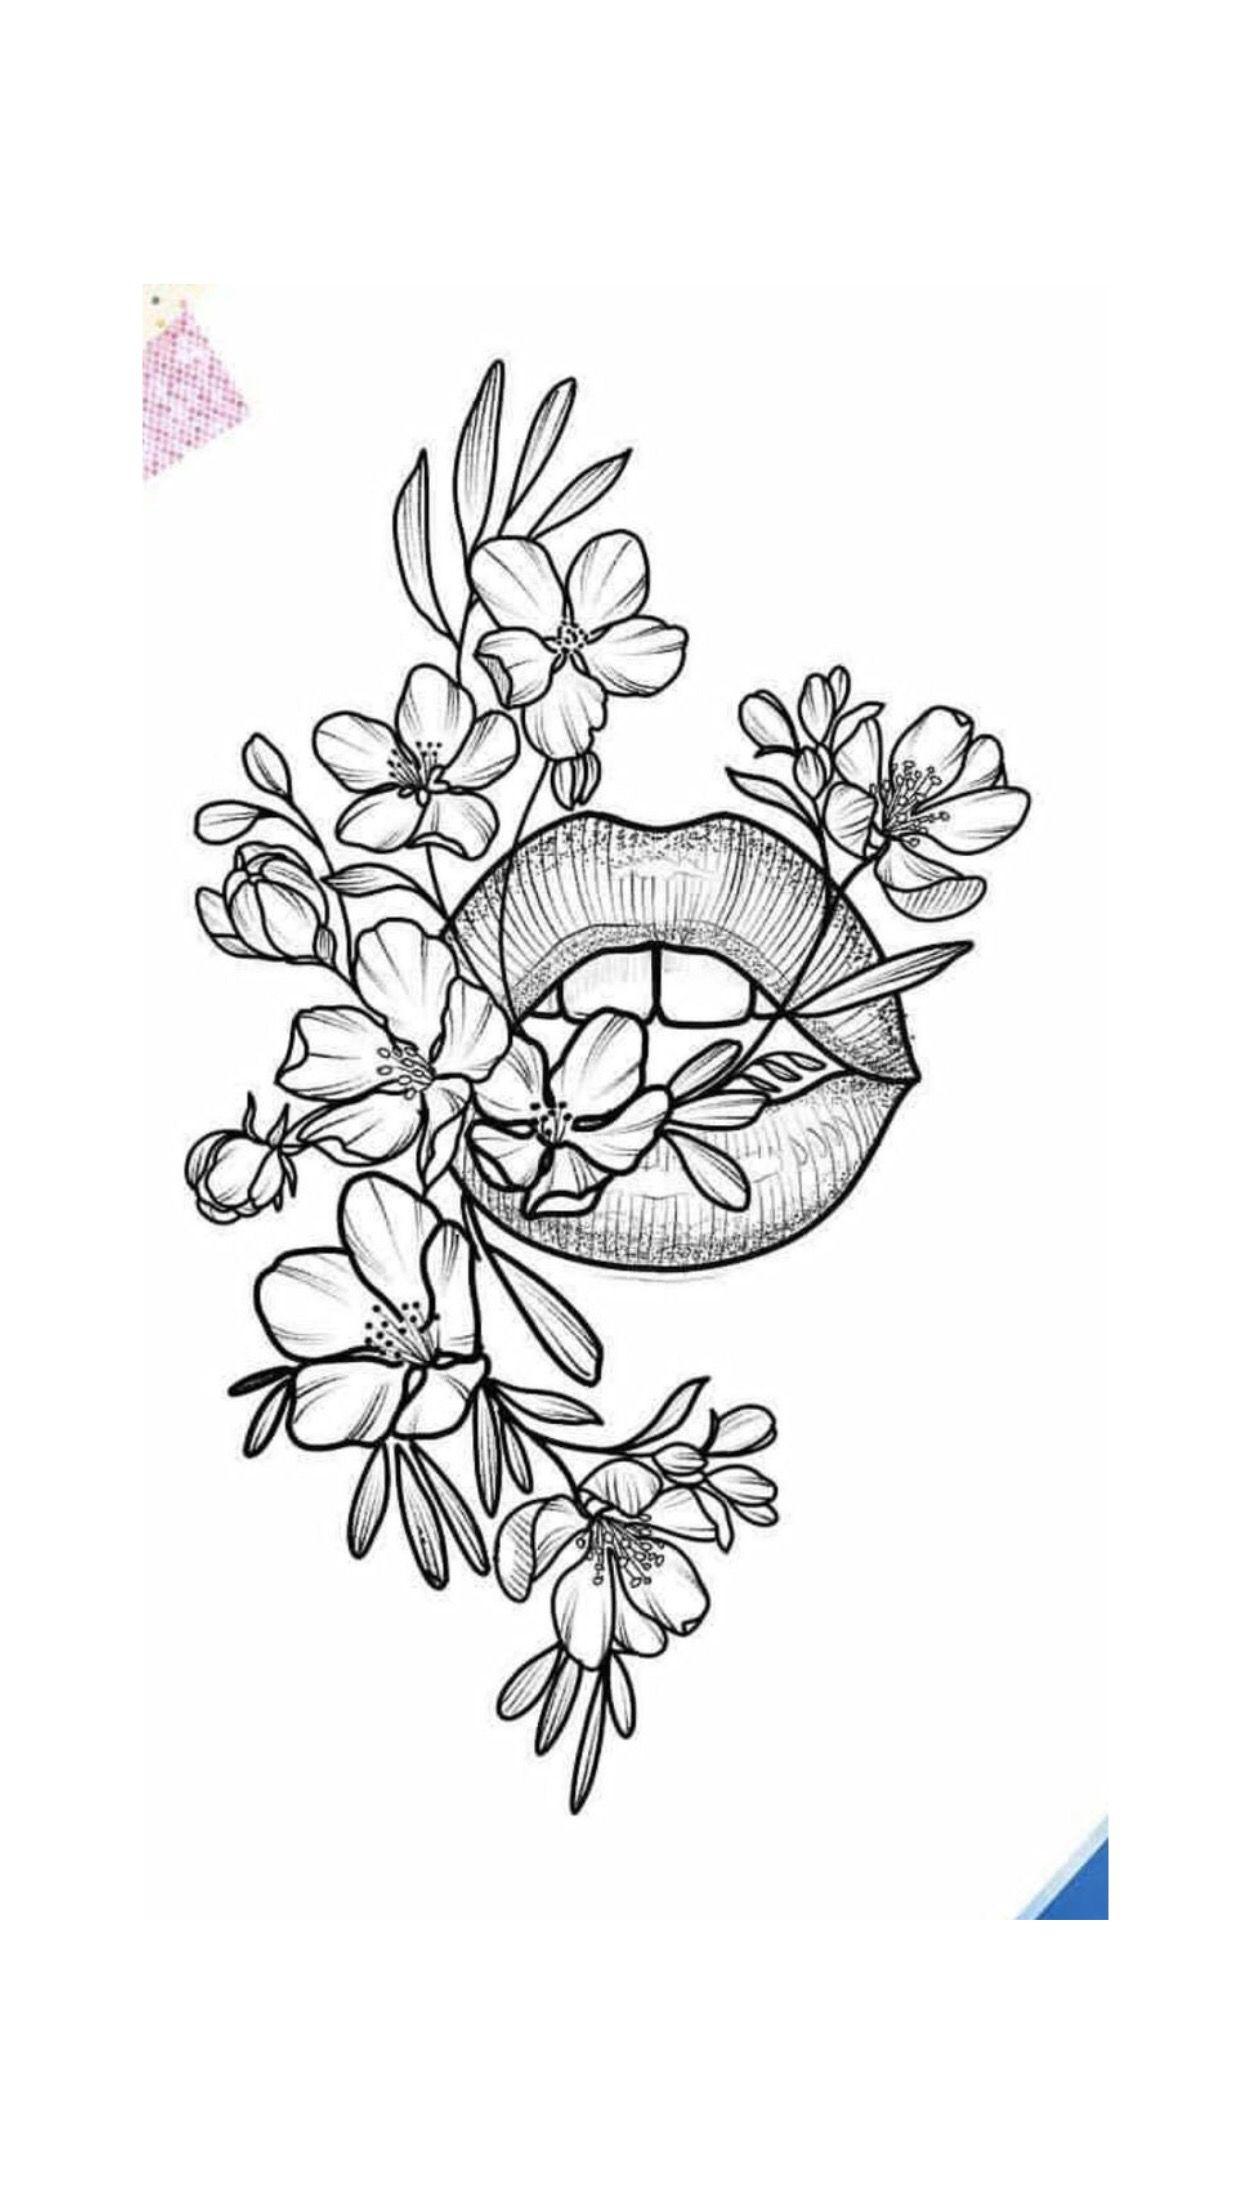 Pin By Soymadeline On Desenhos Lace Tattoo Design Pattern Tattoo Tribal Pattern Tattoos